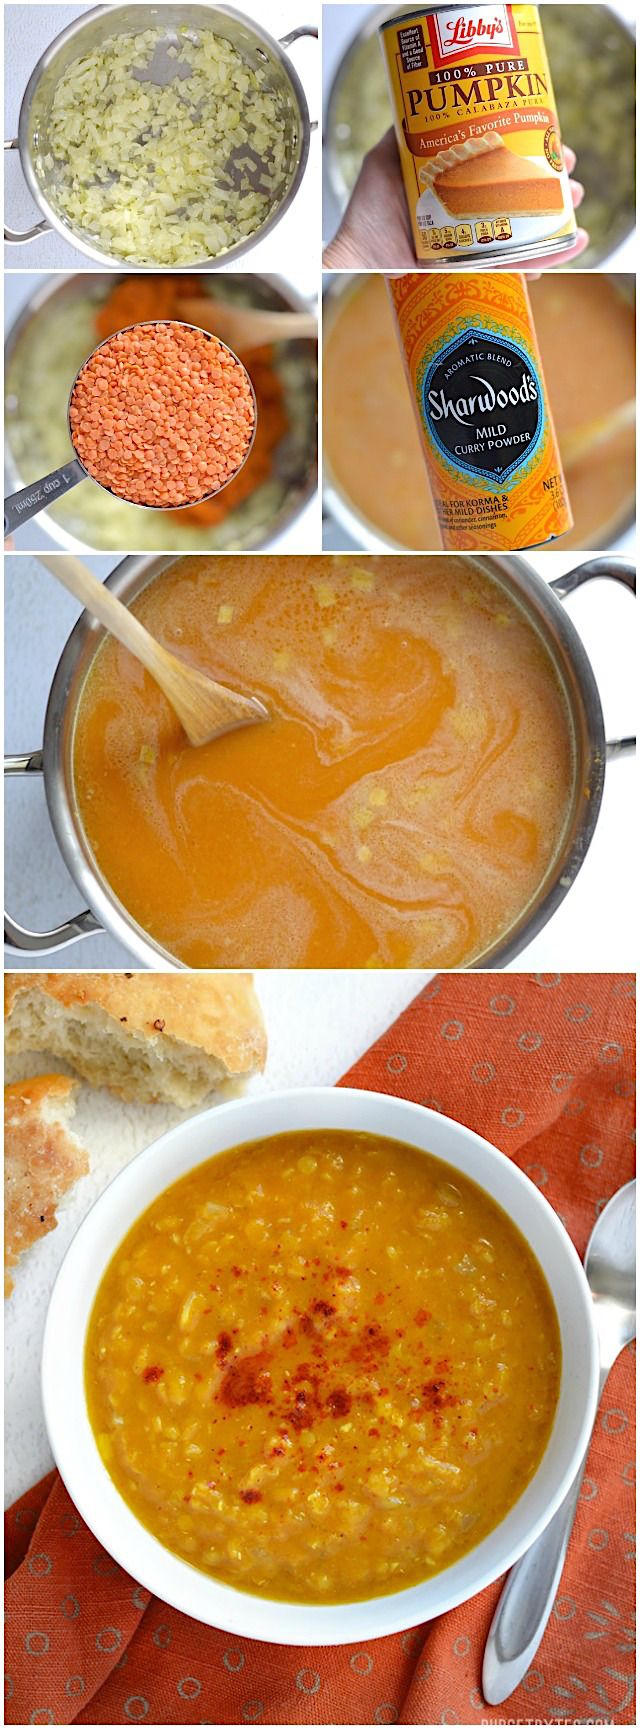 Curried Red Lentil and Pumpkin Soup - BudgetBytes.com